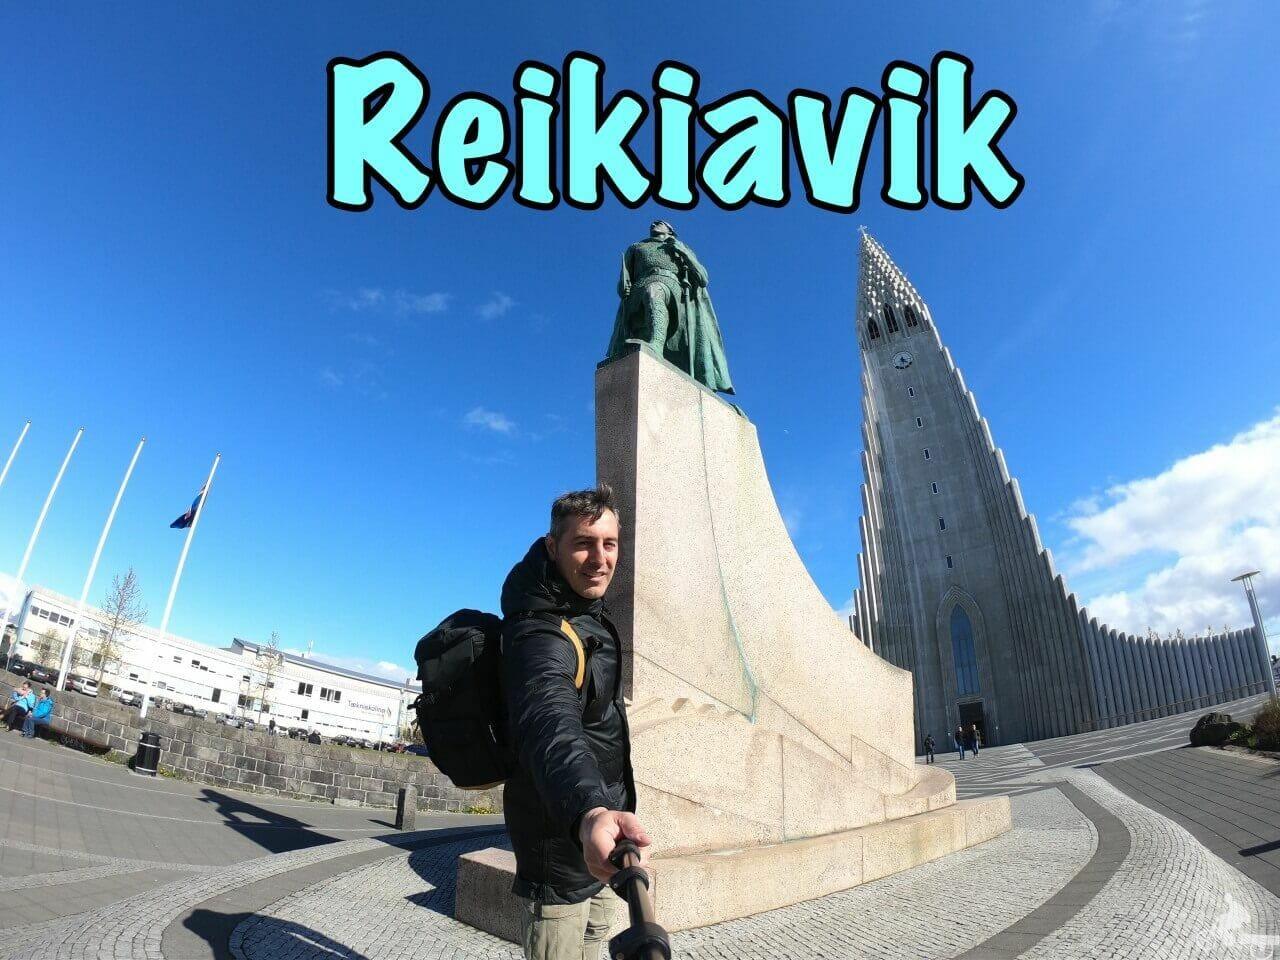 que ver en reikiavik Islandia